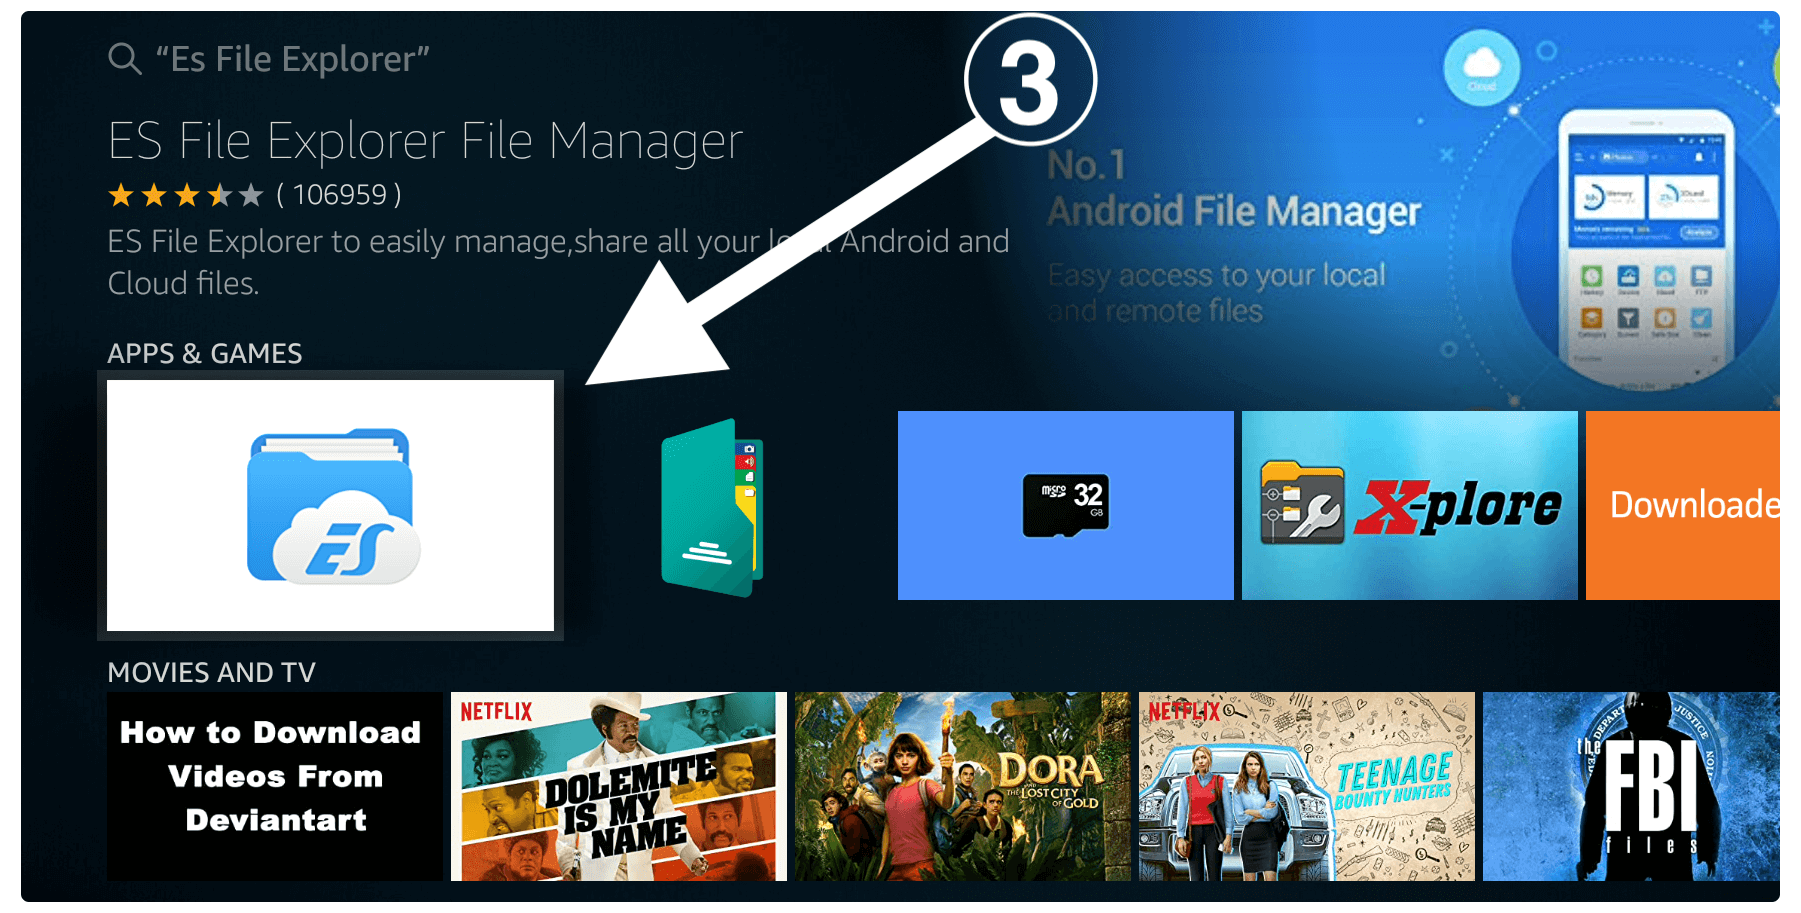 ES-File-Explorer-Firestick-Device